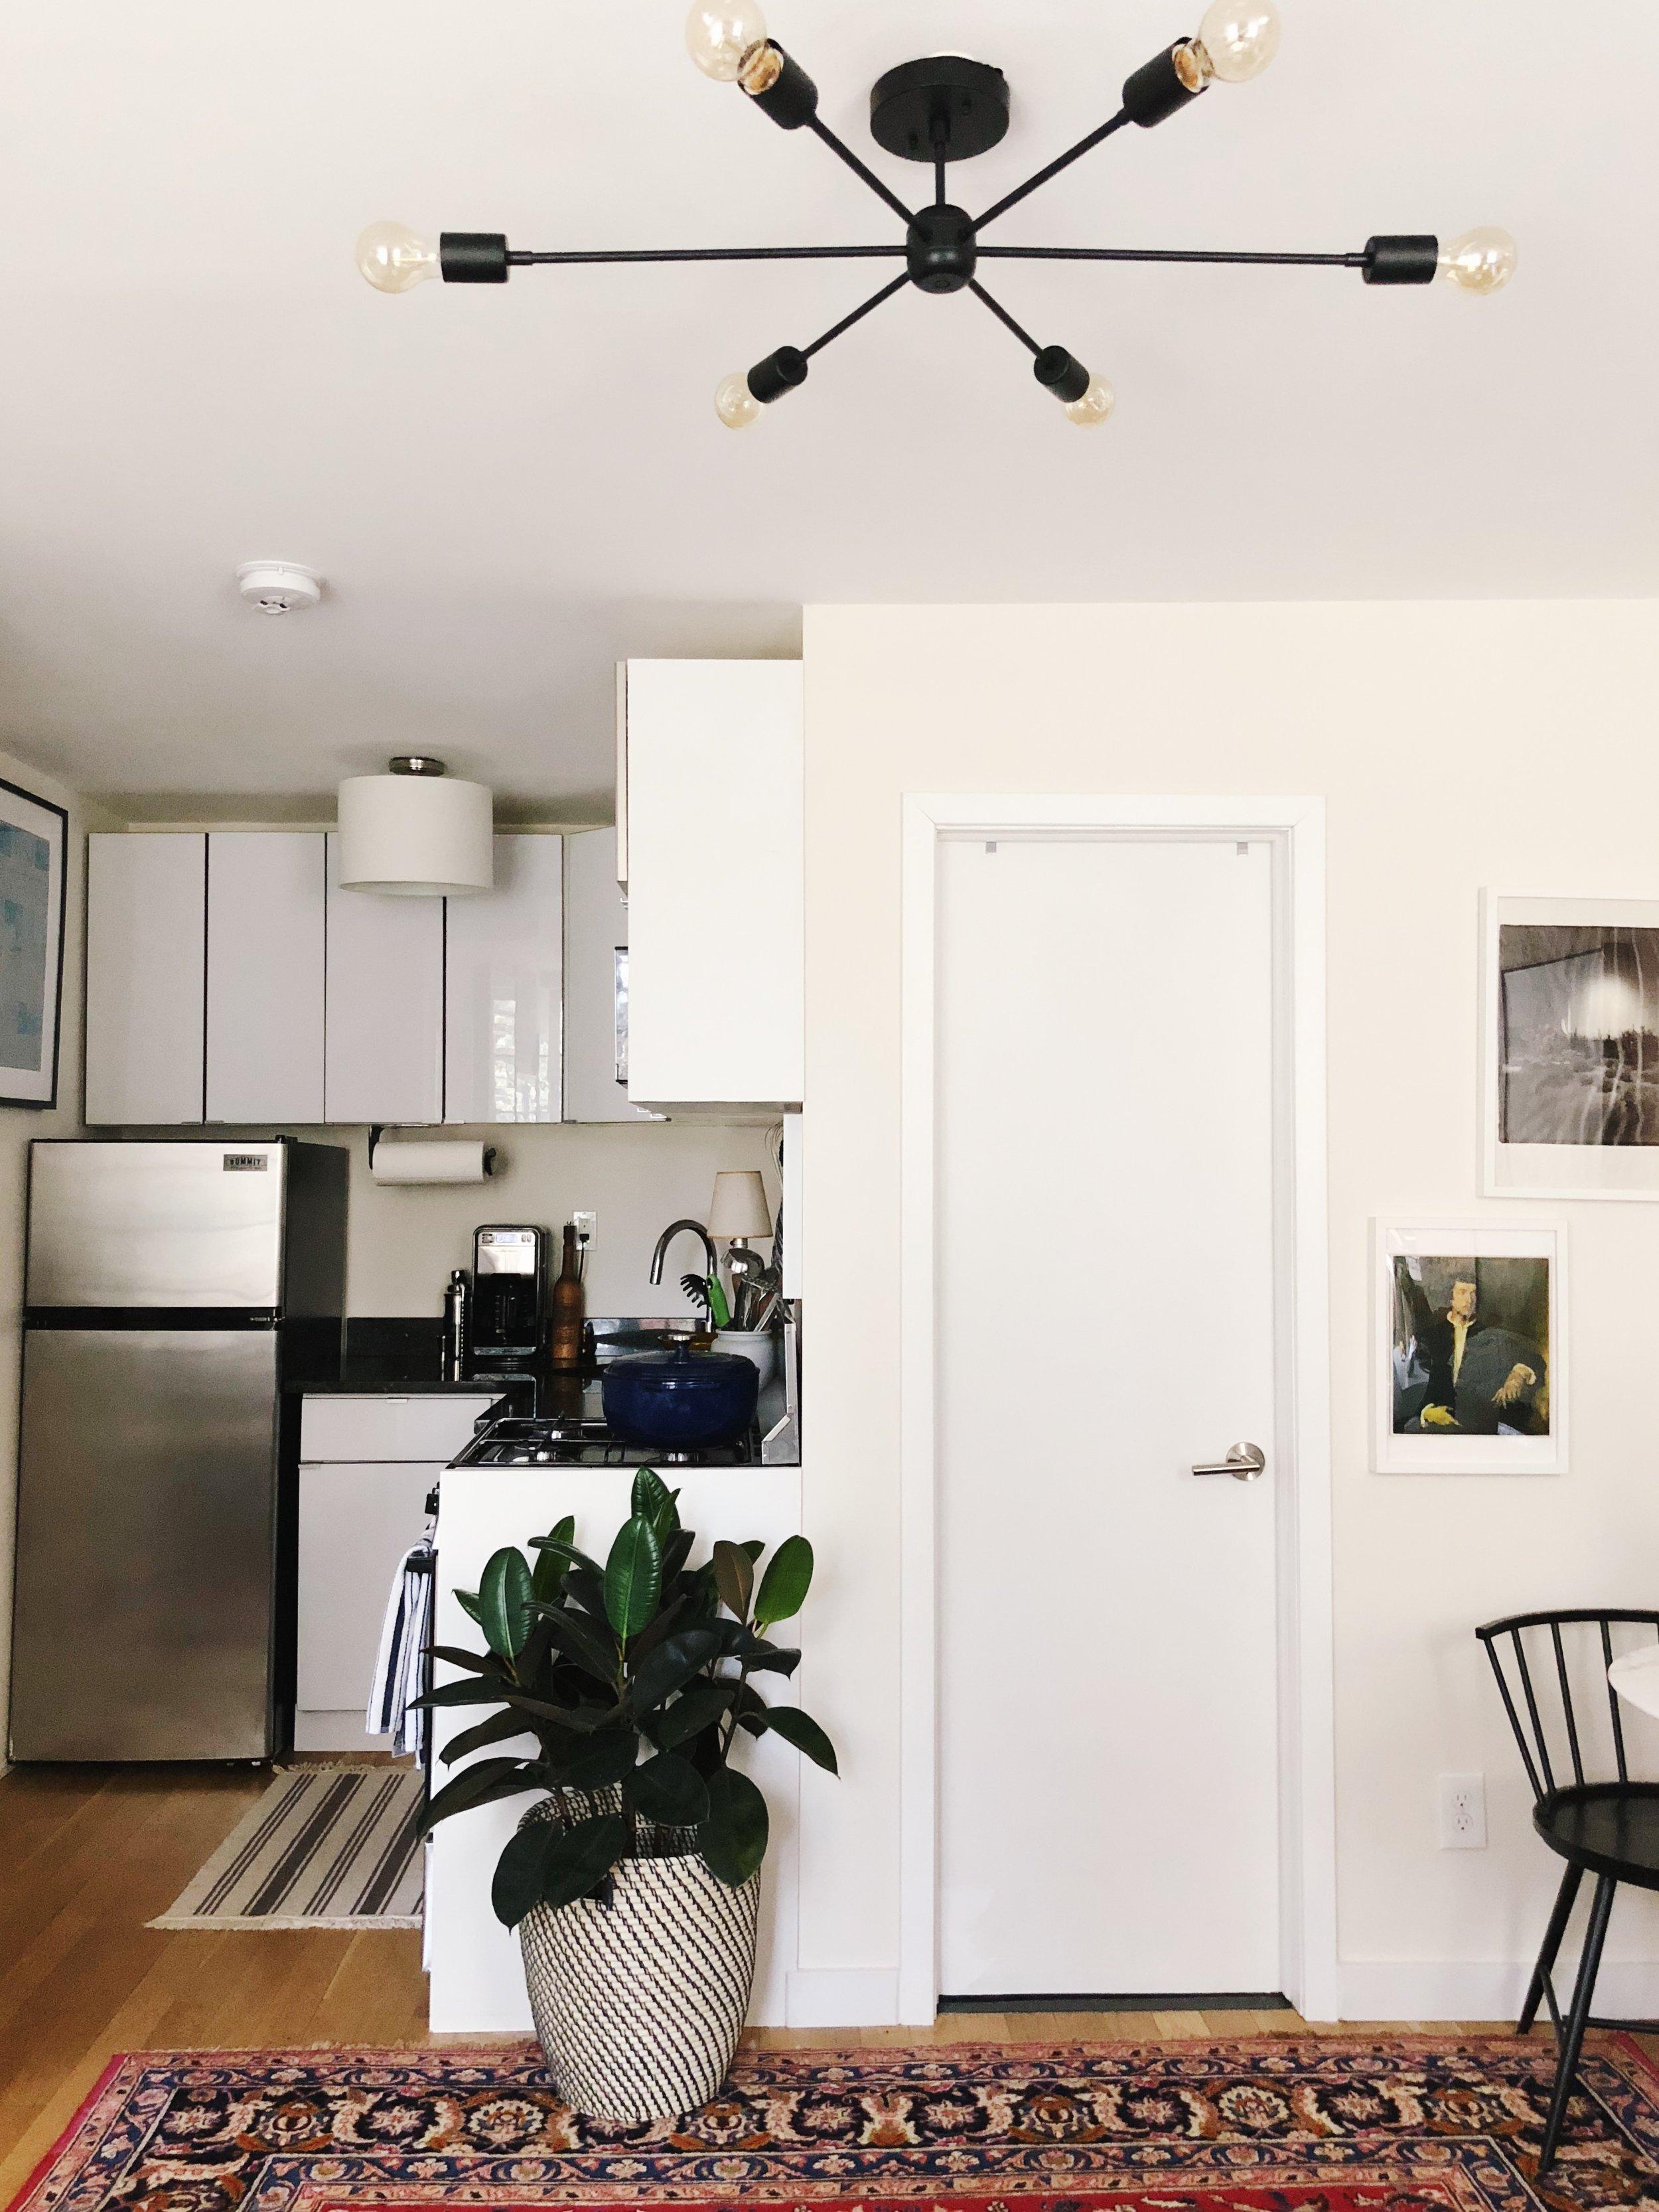 Plant basket:  Ikea . Striped rug:  Ikea . Striped dish towels:  Williams Sonoma .